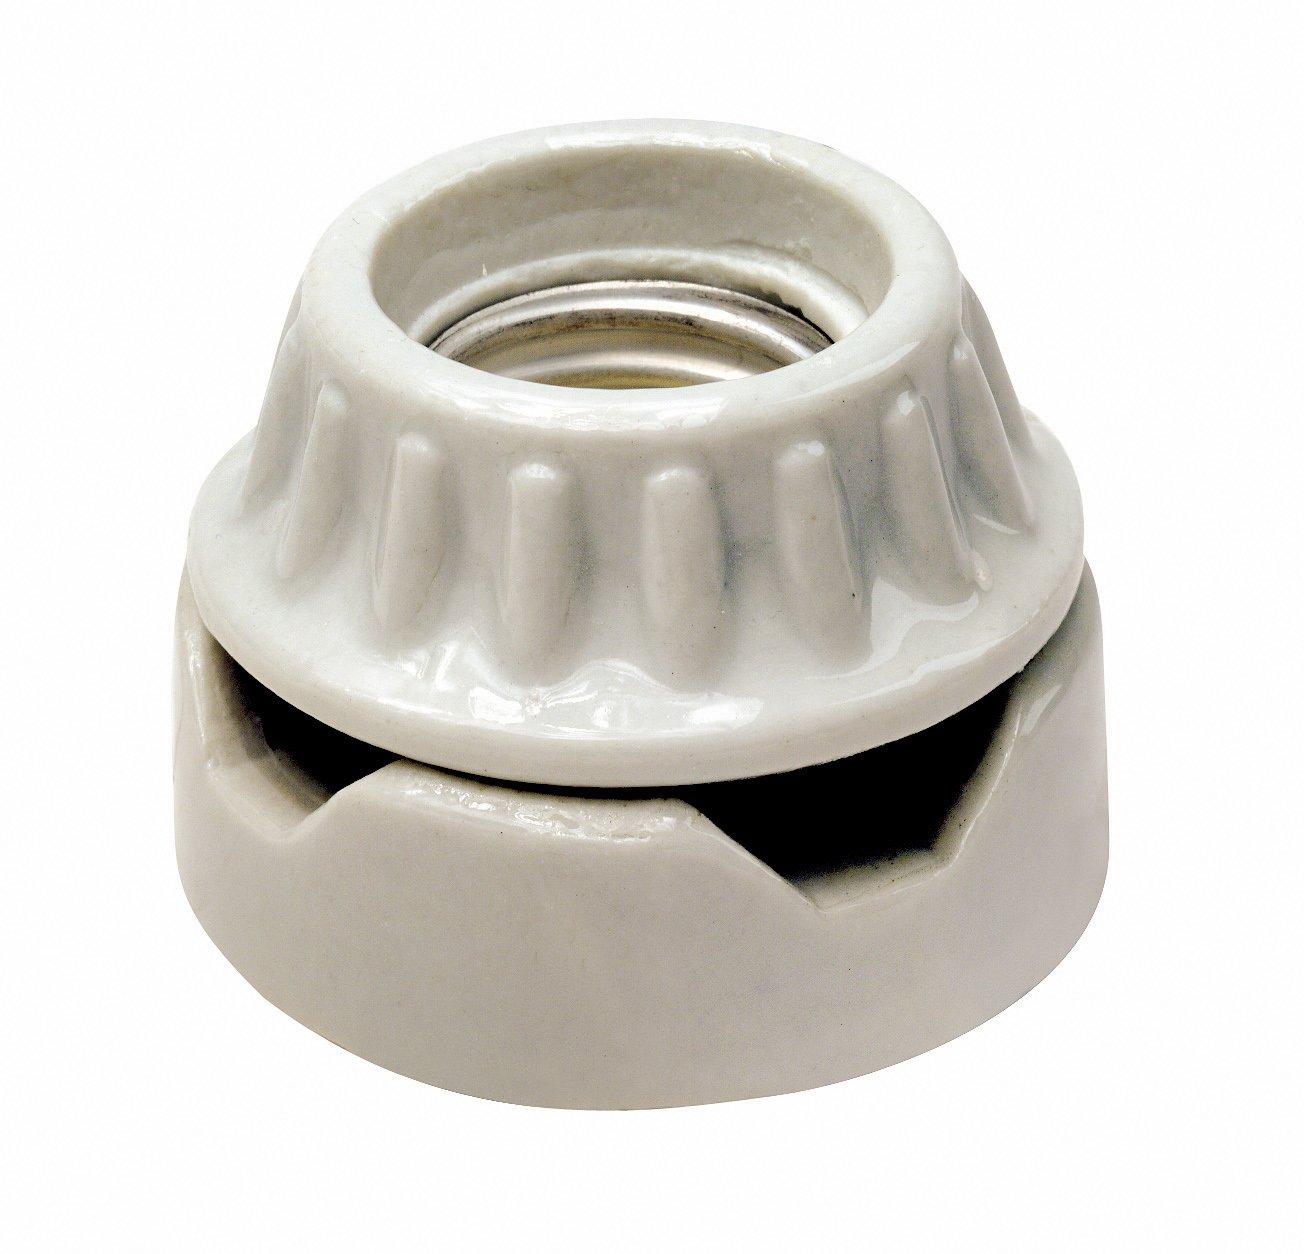 Leviton 9880 Medium Base, Two-Piece, Keyless, Incandescent, Unglazed Porcelain Lampholder, Surface Mount Low, Single Circuit, Back Wired, White